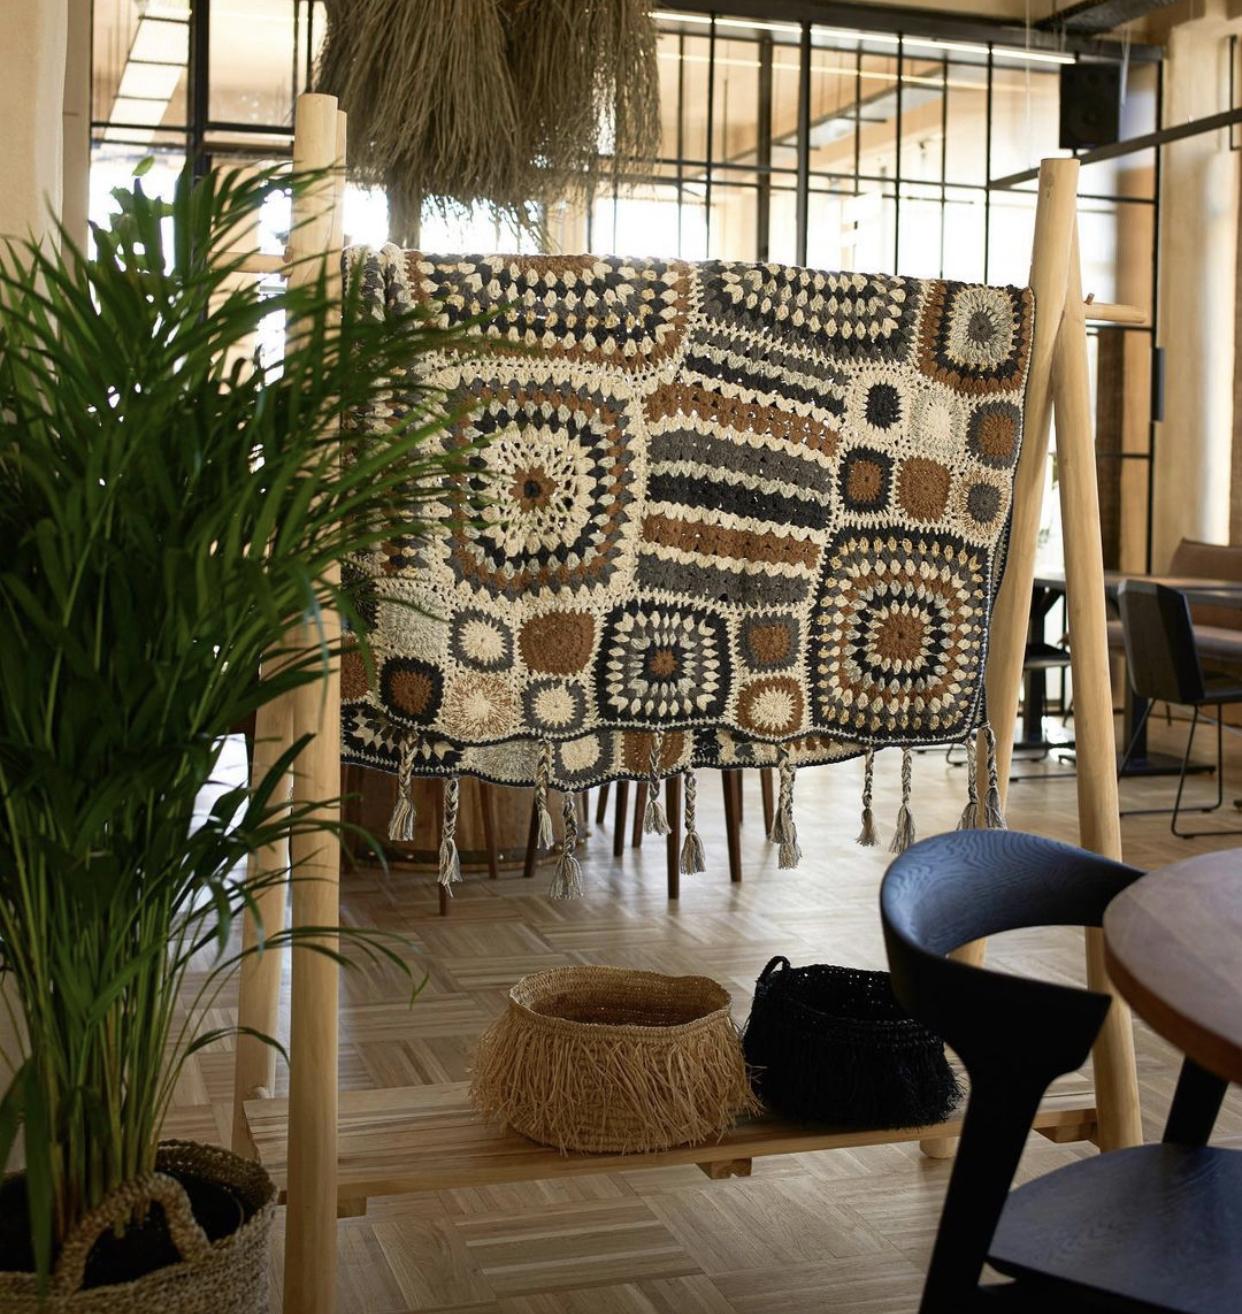 Weekday Wanderlust | Restaurant: Pot Stories, Romania